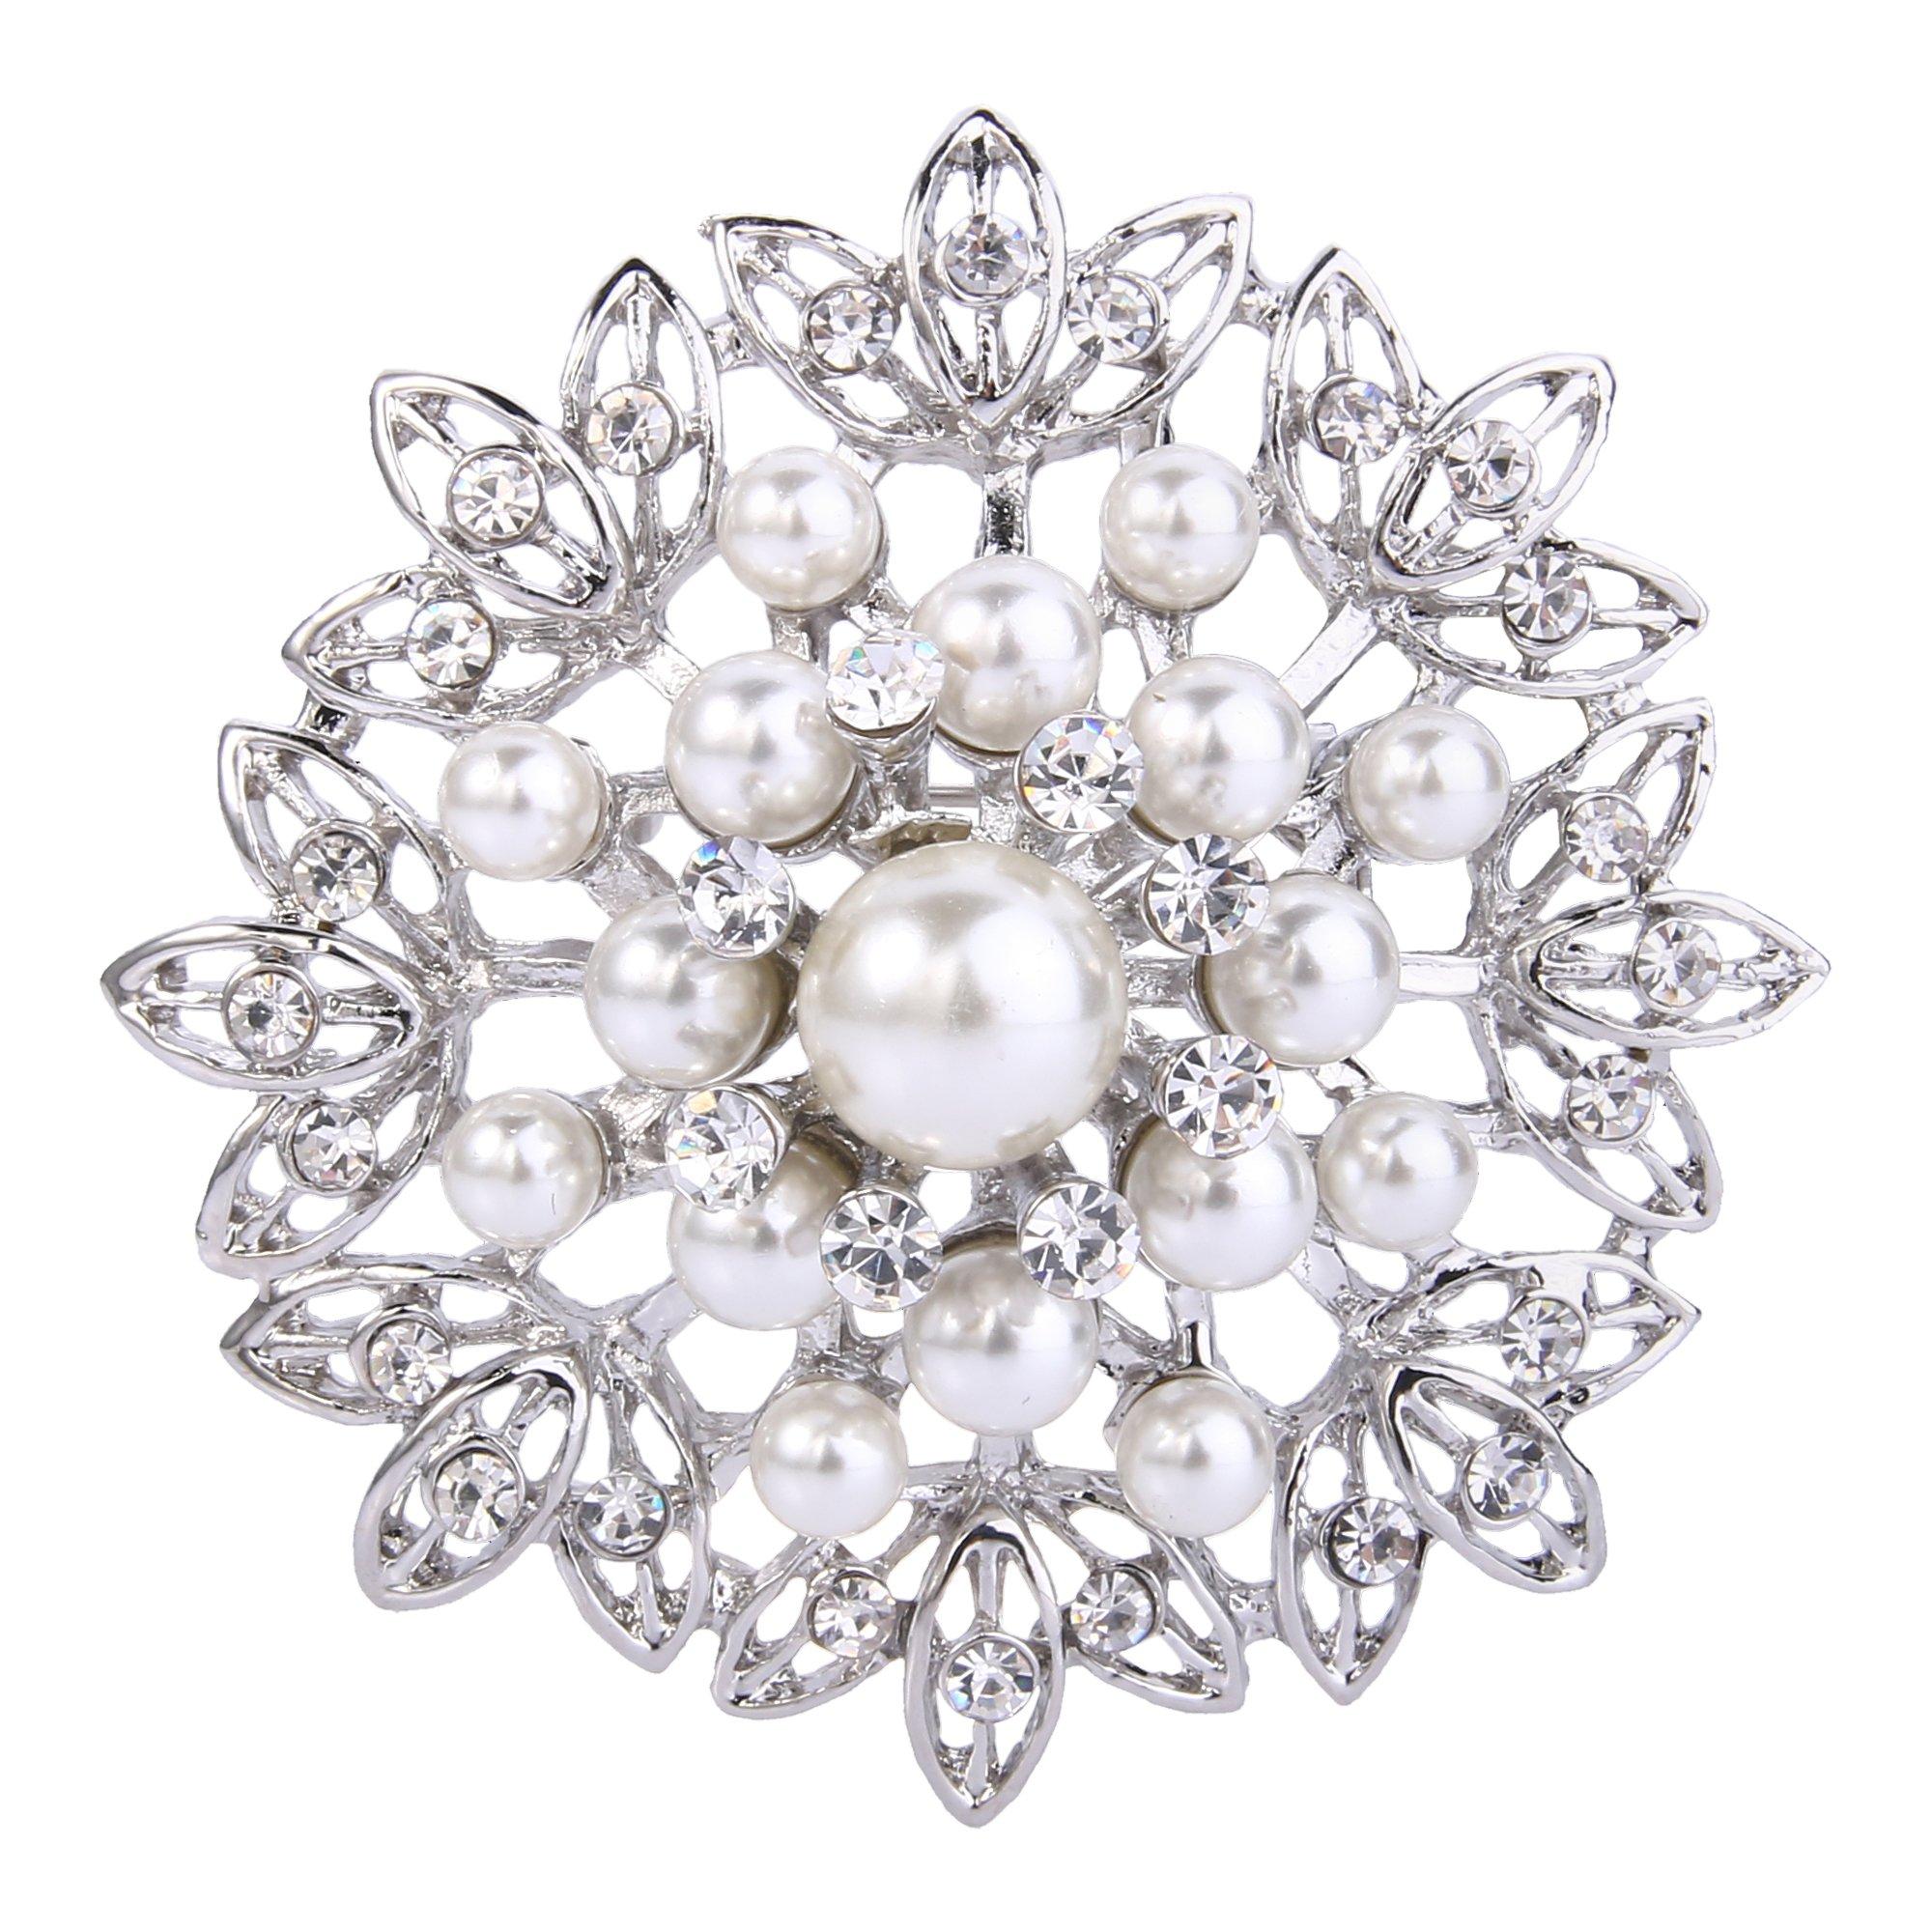 EVER FAITH Women's Crystal Cream Simulated Pearl Elegant Flower Leaf Corsage Brooch Clear Silver-Tone